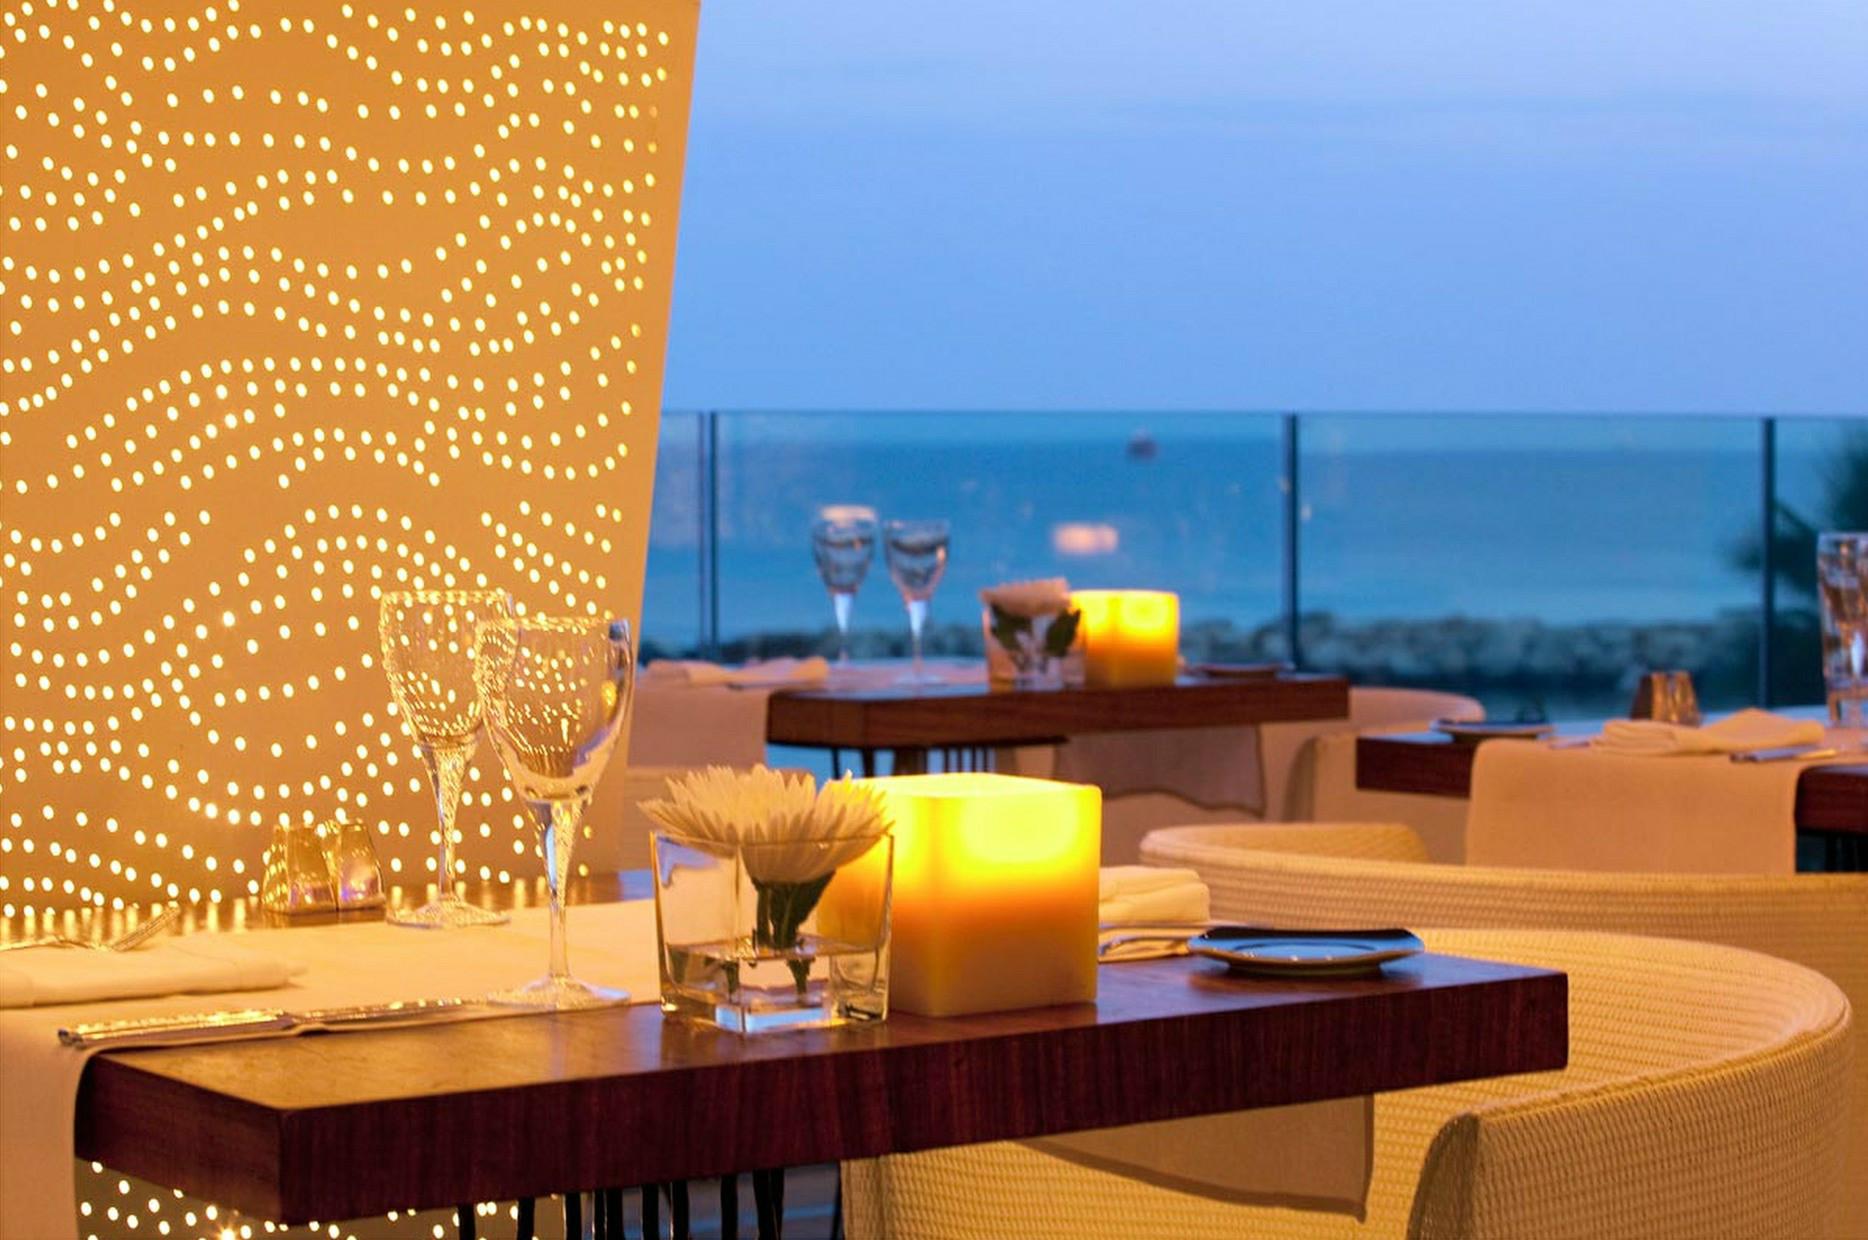 Cyprus dinner news online cha ne des r tisseurs for Chaine hotel restaurant